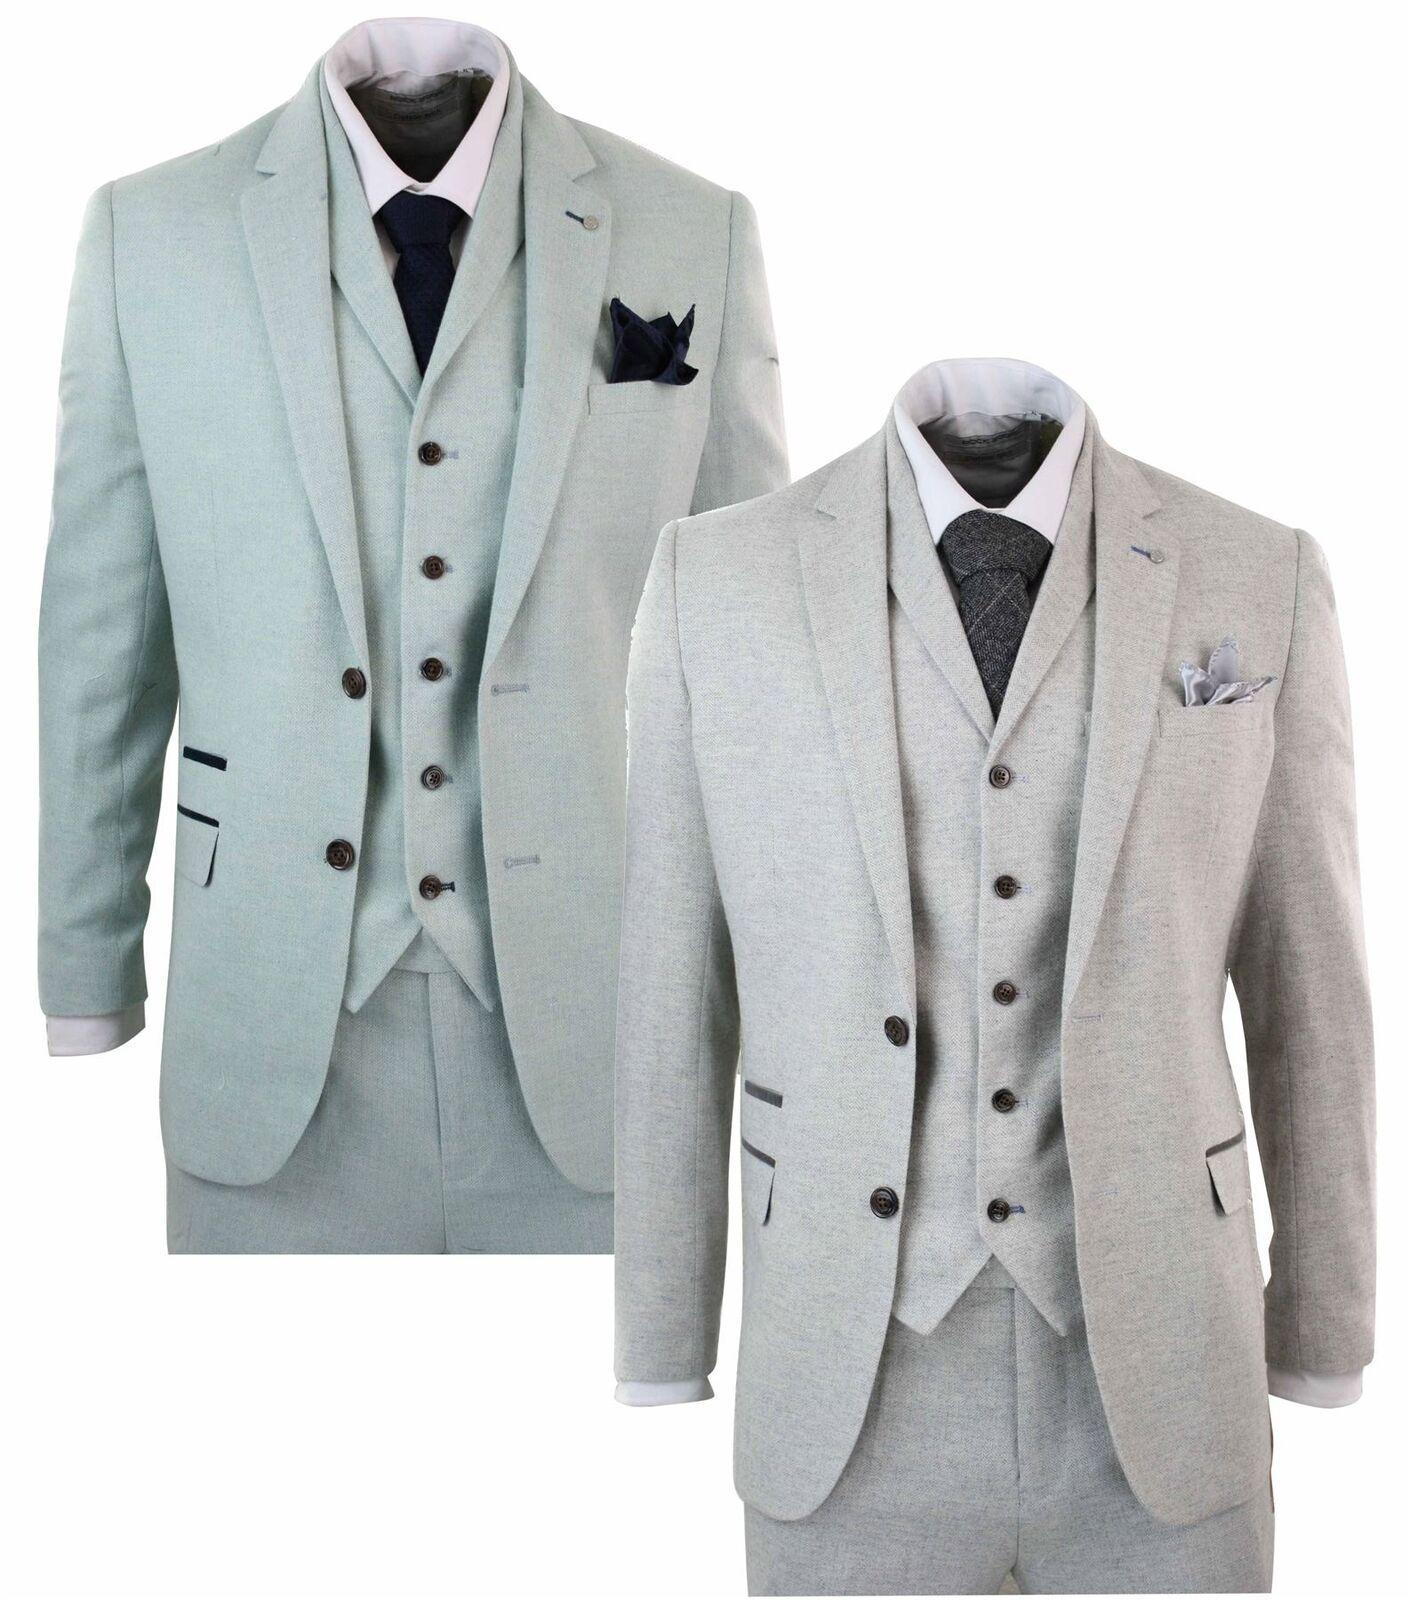 Mens Herringbone Tweed 3 Piece Tailored Fit Suit Light Grey Green Wedding Prom